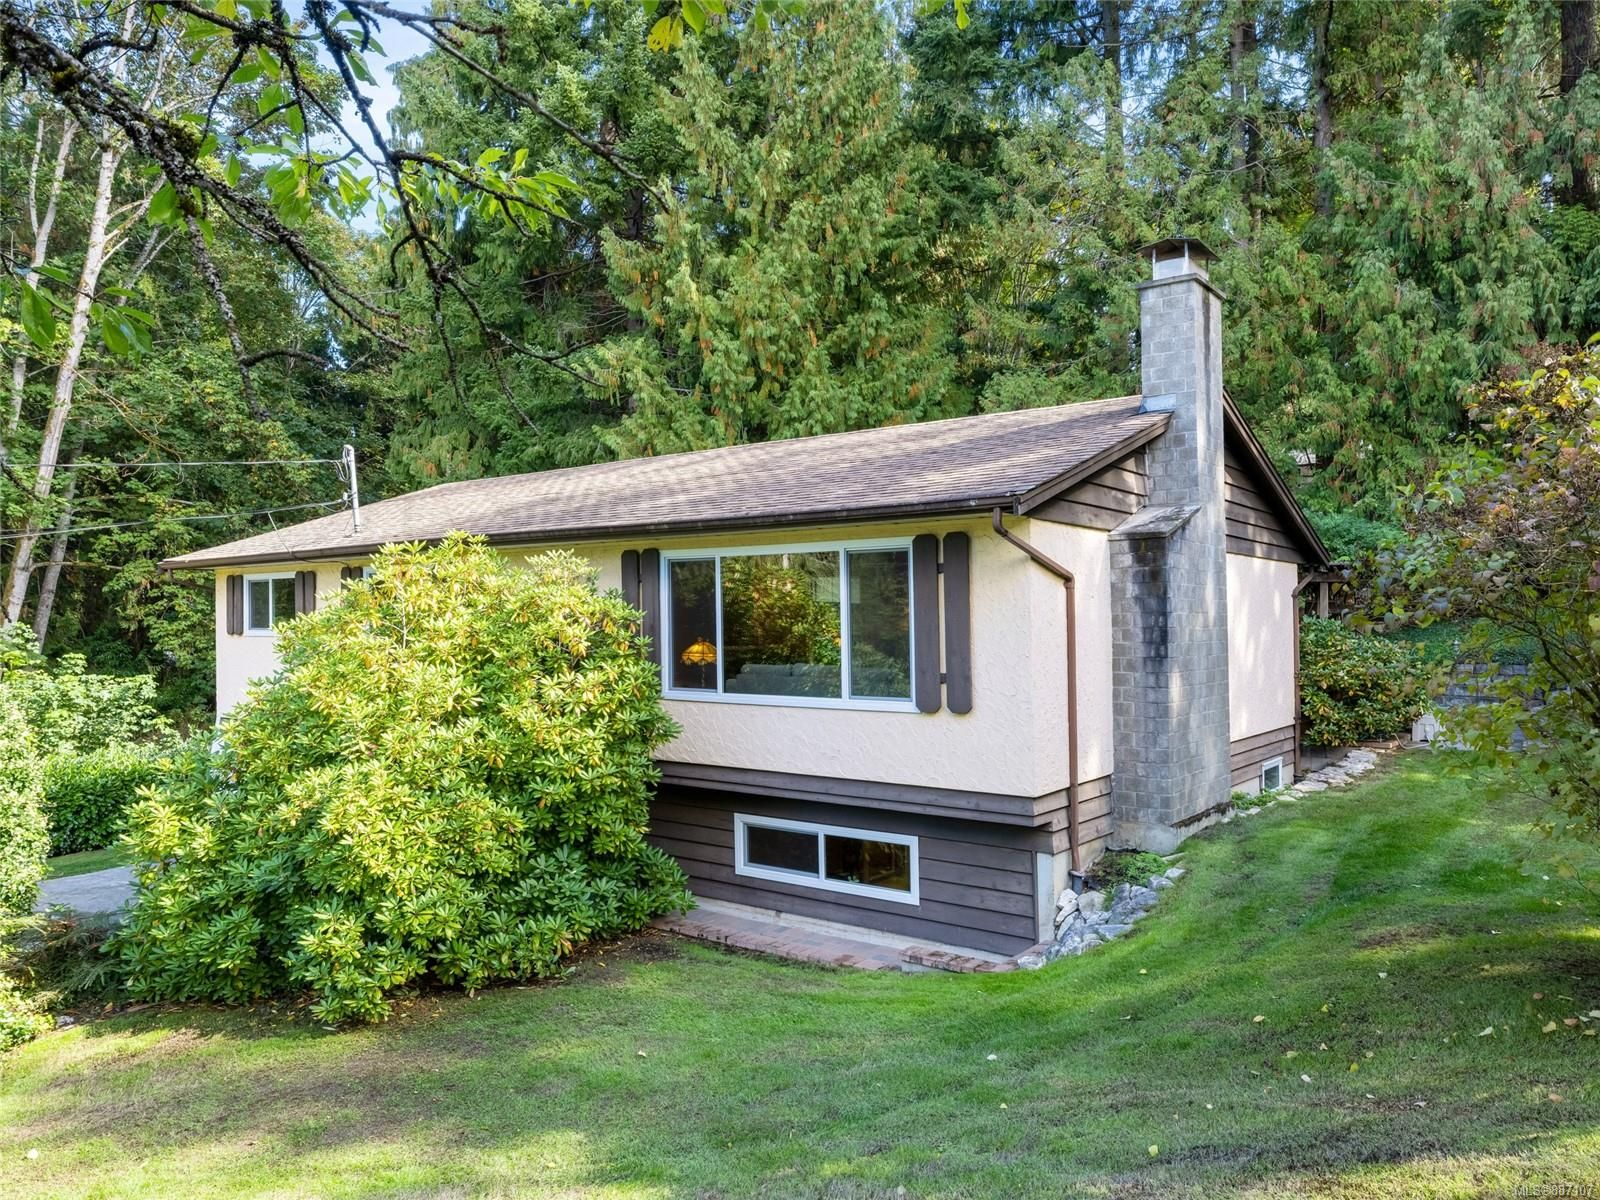 Main Photo: 2749 Joanna Terr in Nanaimo: Na Diver Lake House for sale : MLS®# 887107